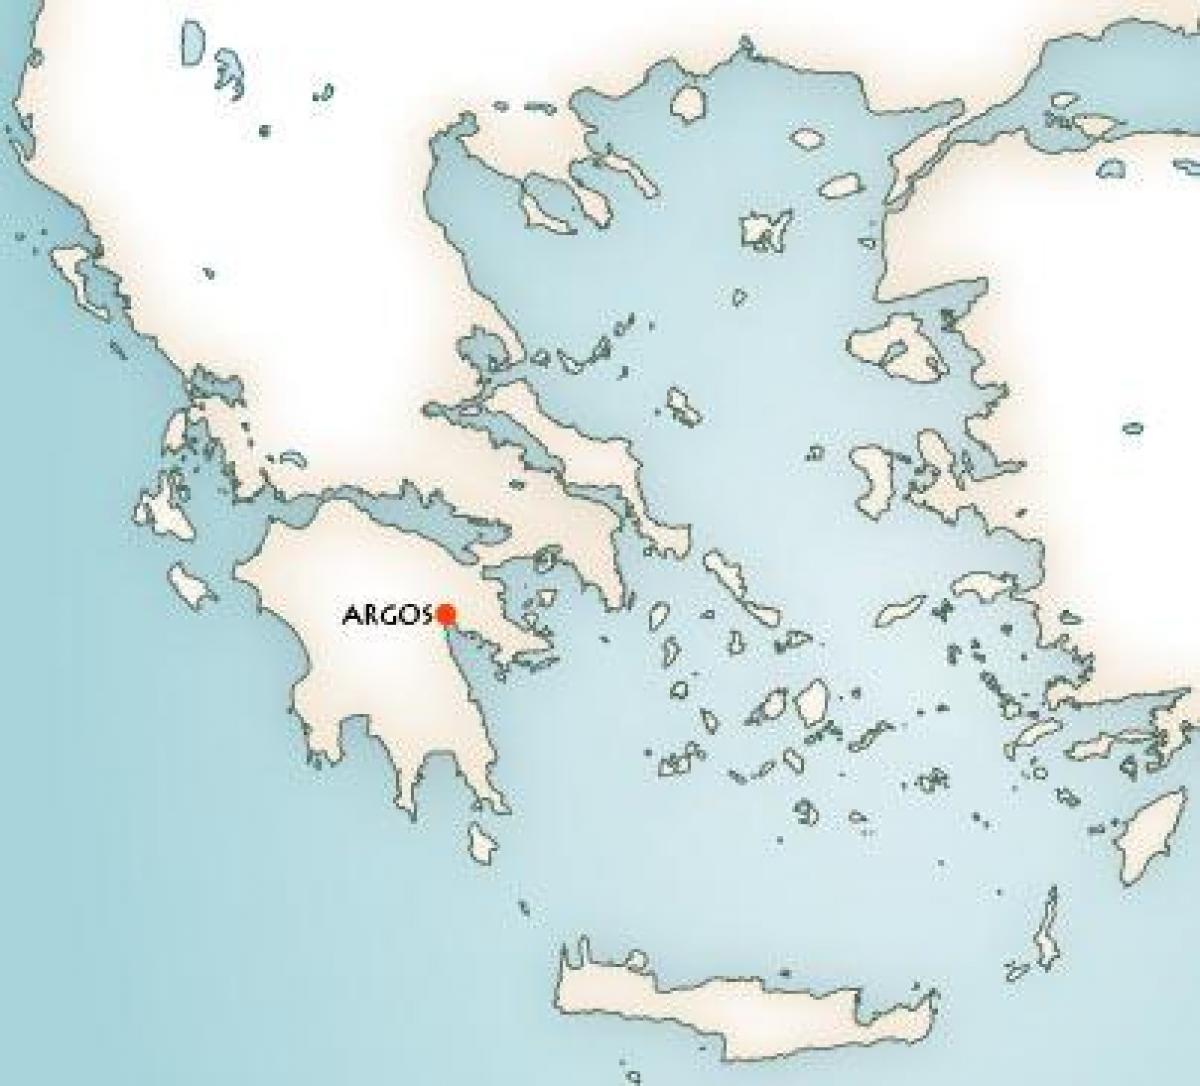 Argos Grecia Harta Hartă Din Argos Grecia Europa De Sud Europa